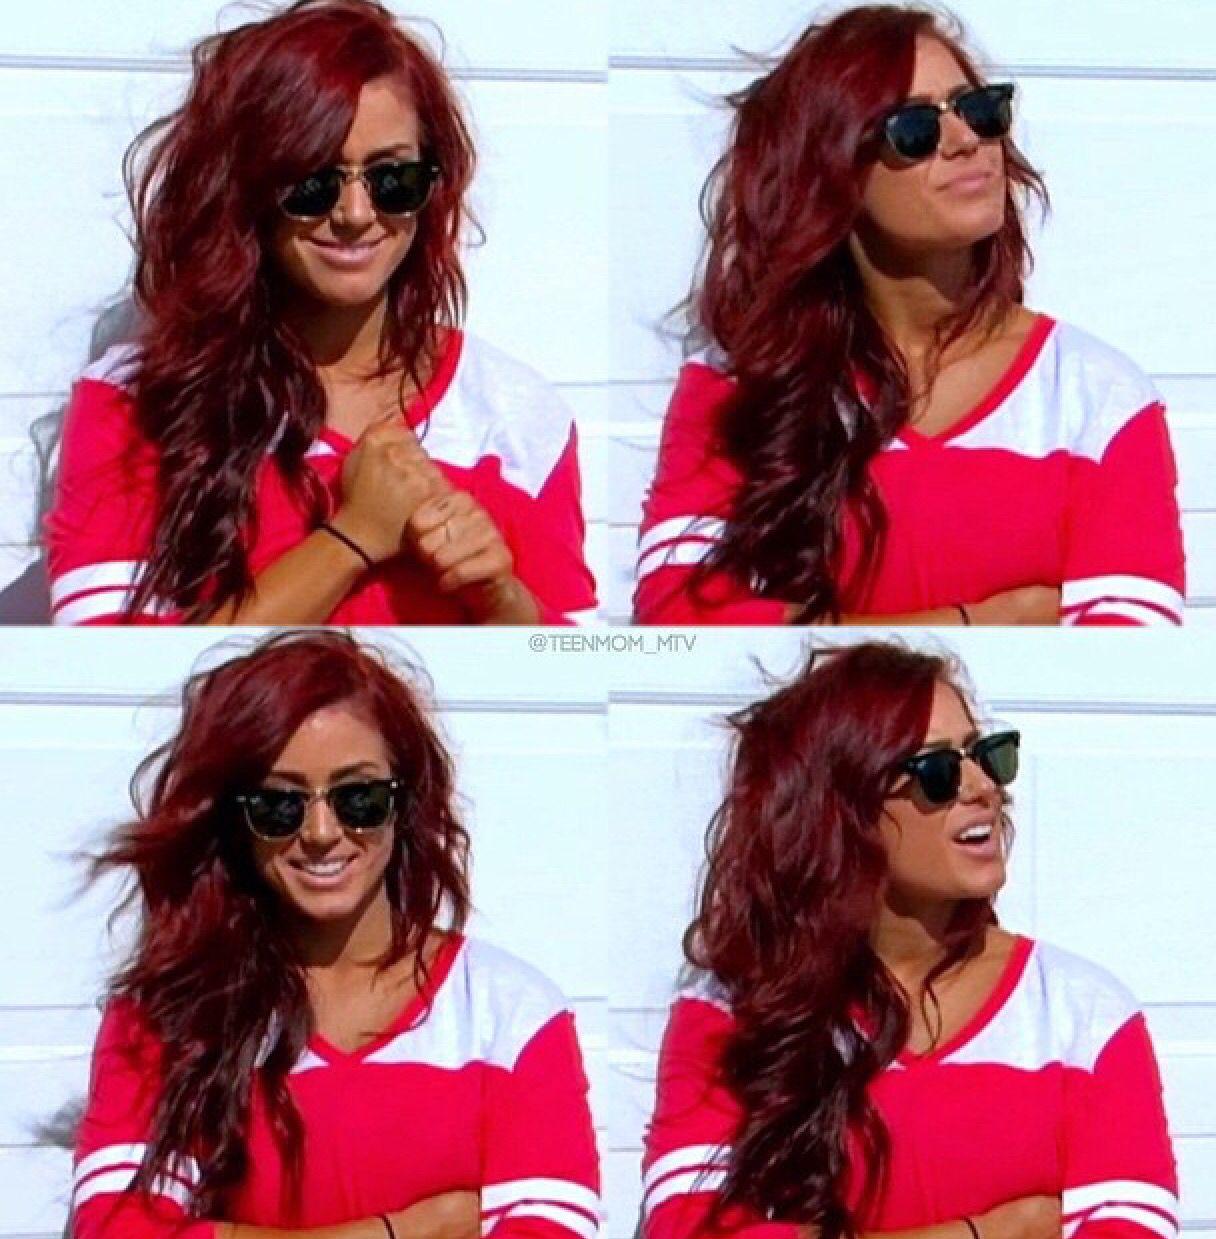 insta // twitter: brianamcevoy   chelsea houska   hair color